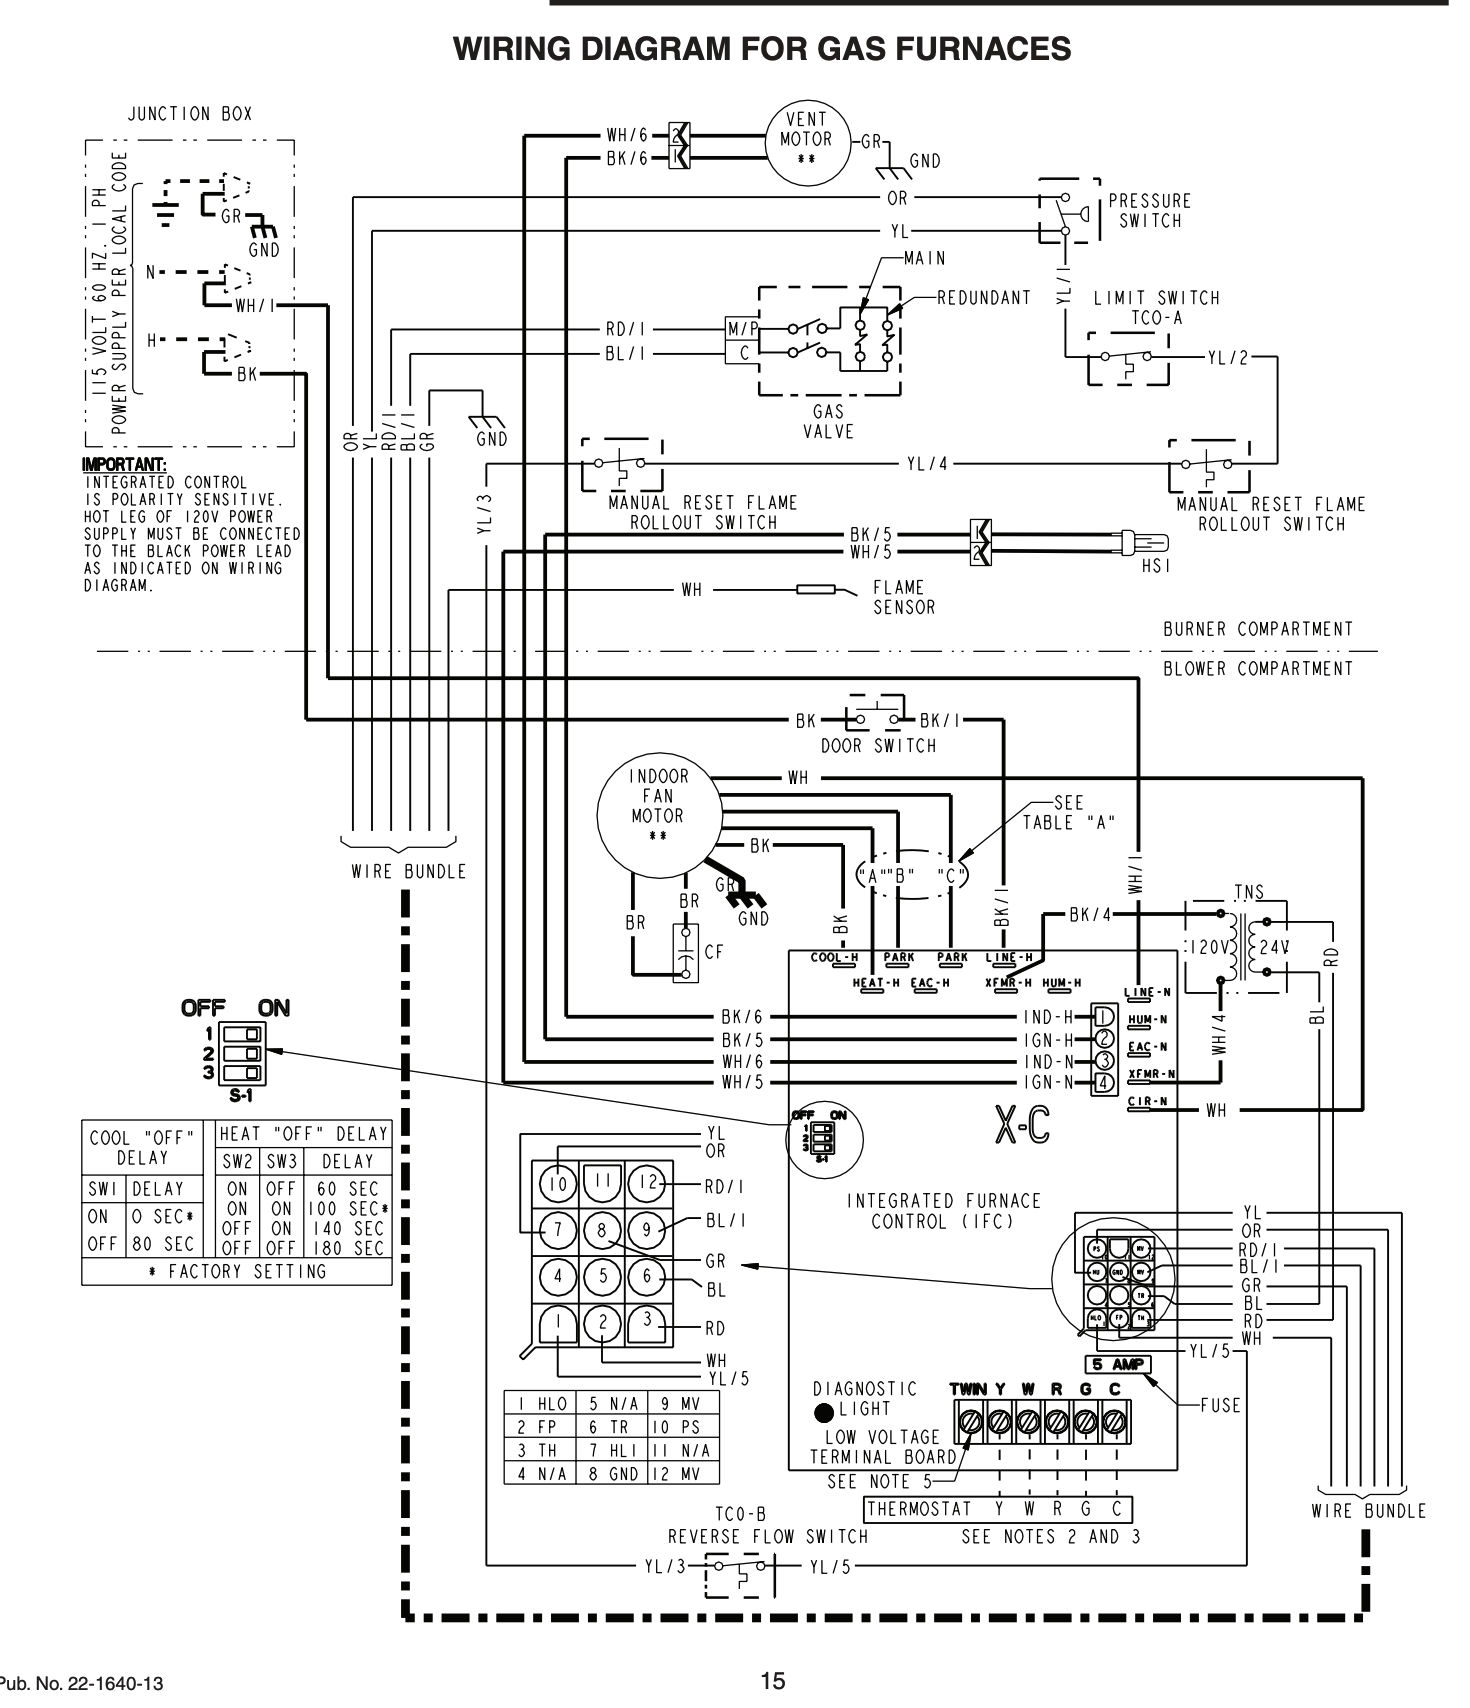 Rtha Chiller Wiring Diagram | Wiring Diagram on